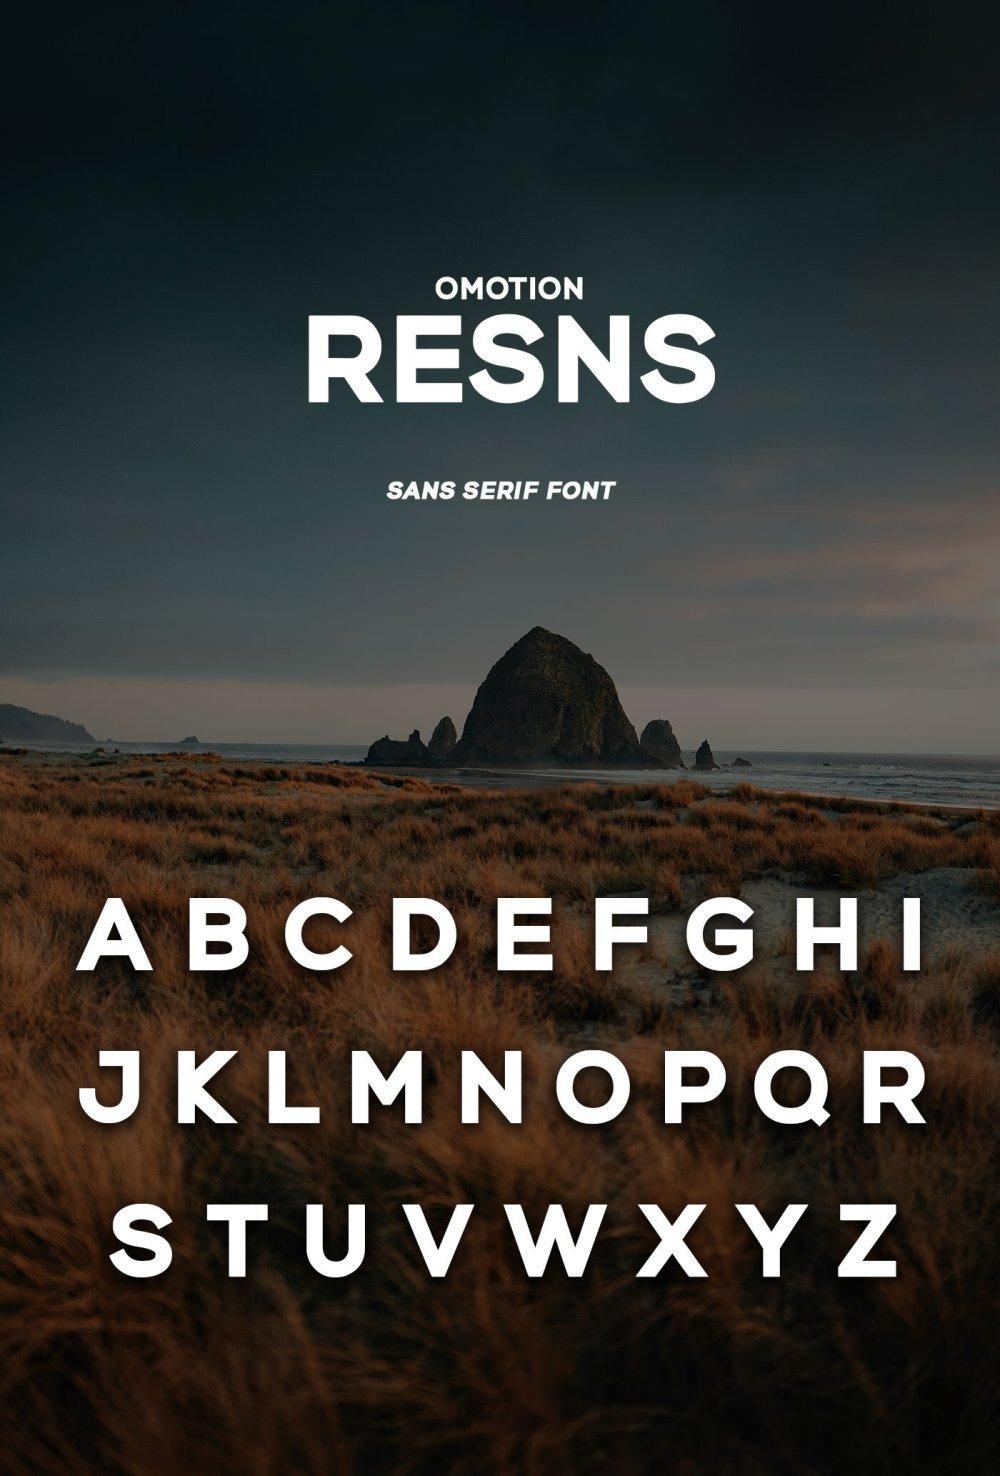 omotion Resns Free Sans Serif Font